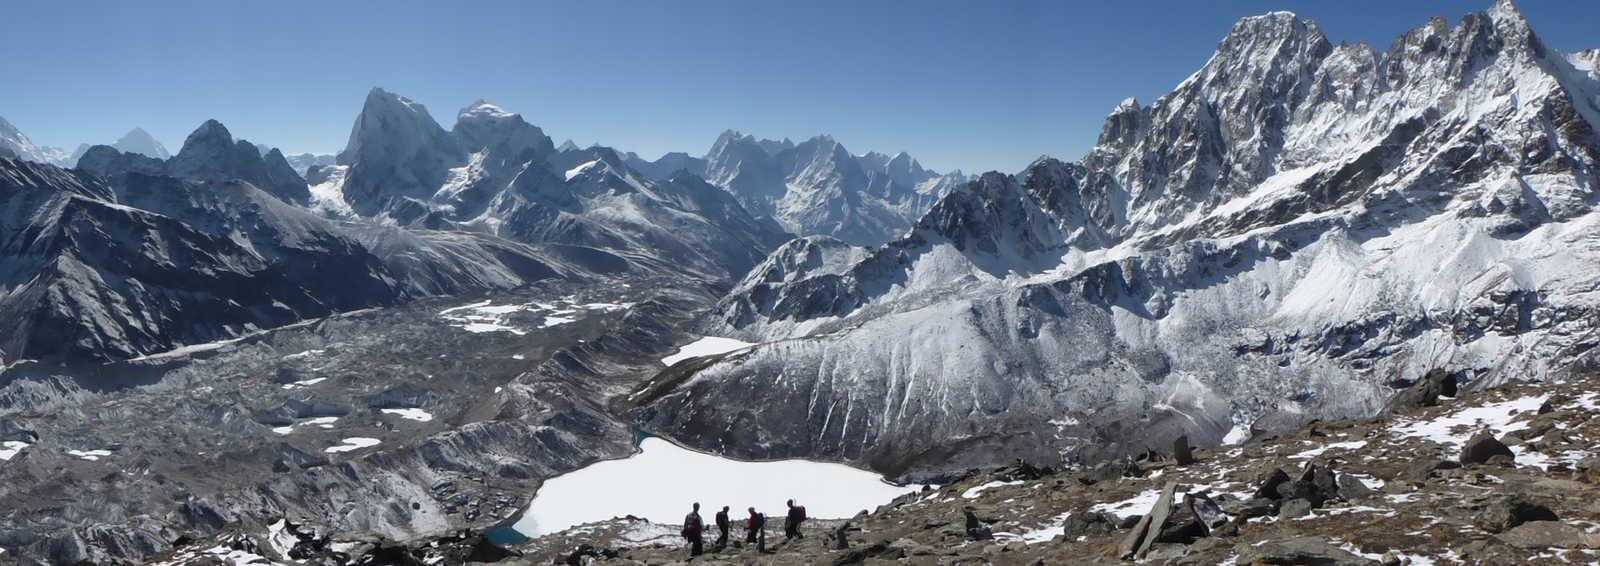 Gokyo Ri Mt Everest, Nepal